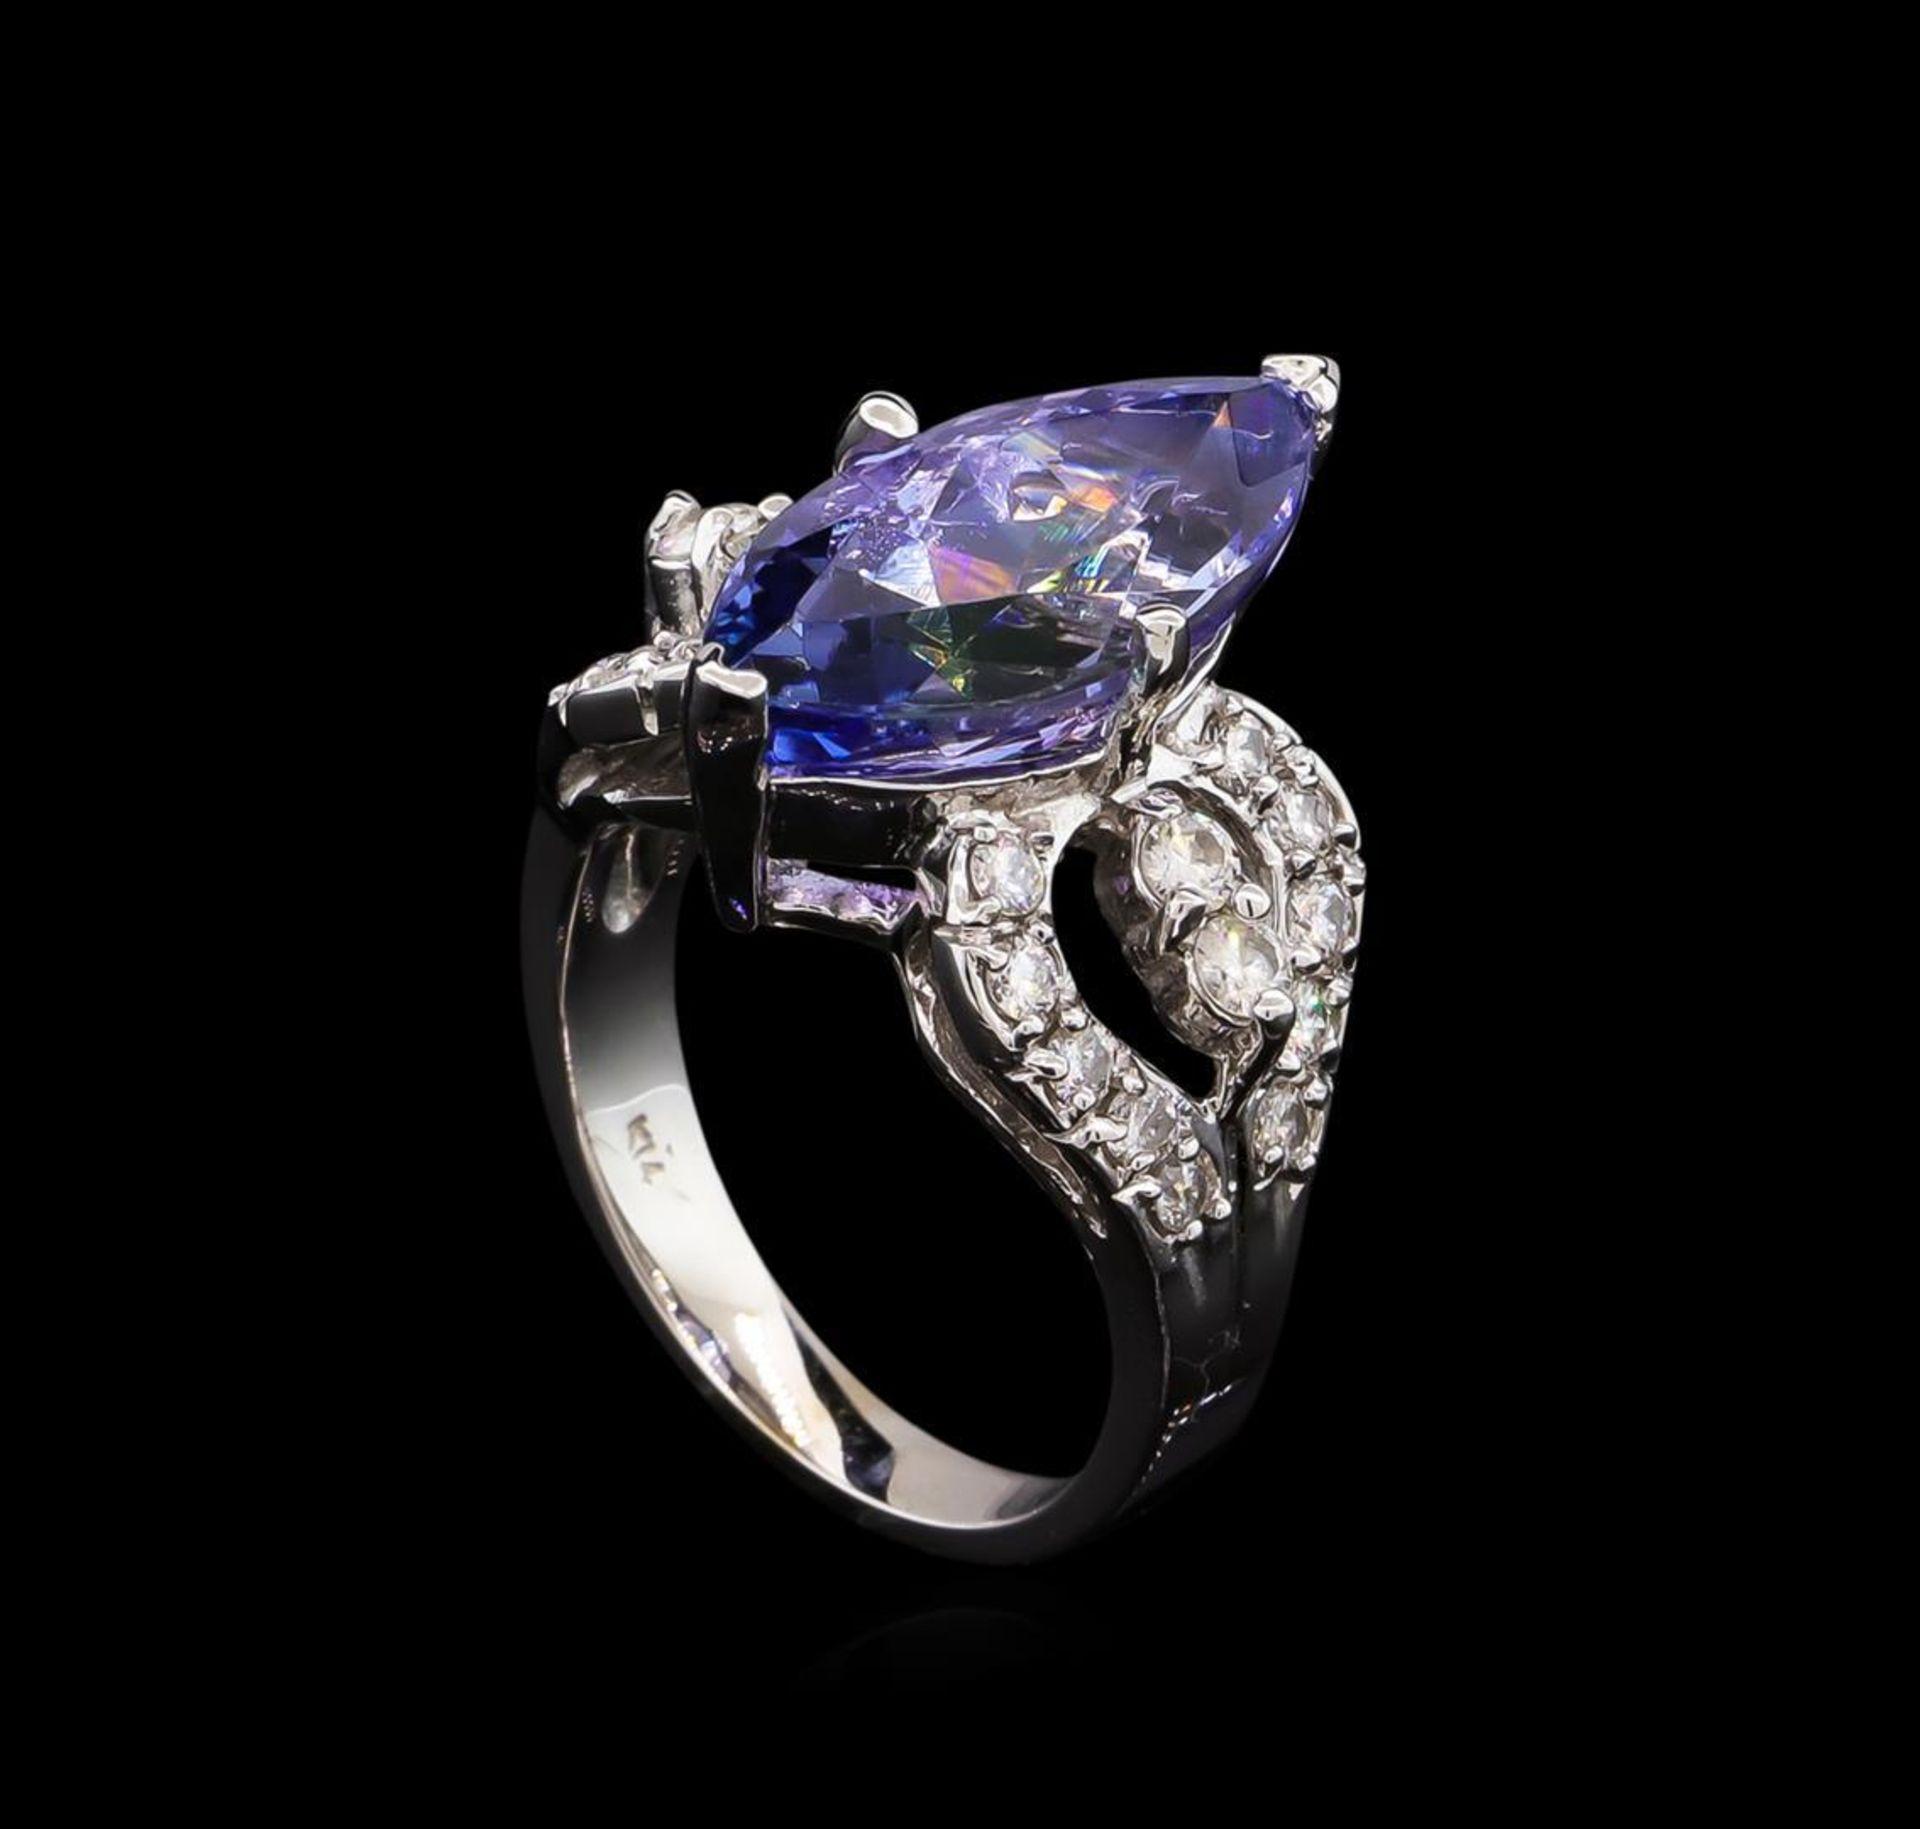 6.70 ctw Tanzanite and Diamond Ring - 14KT White Gold - Image 4 of 5